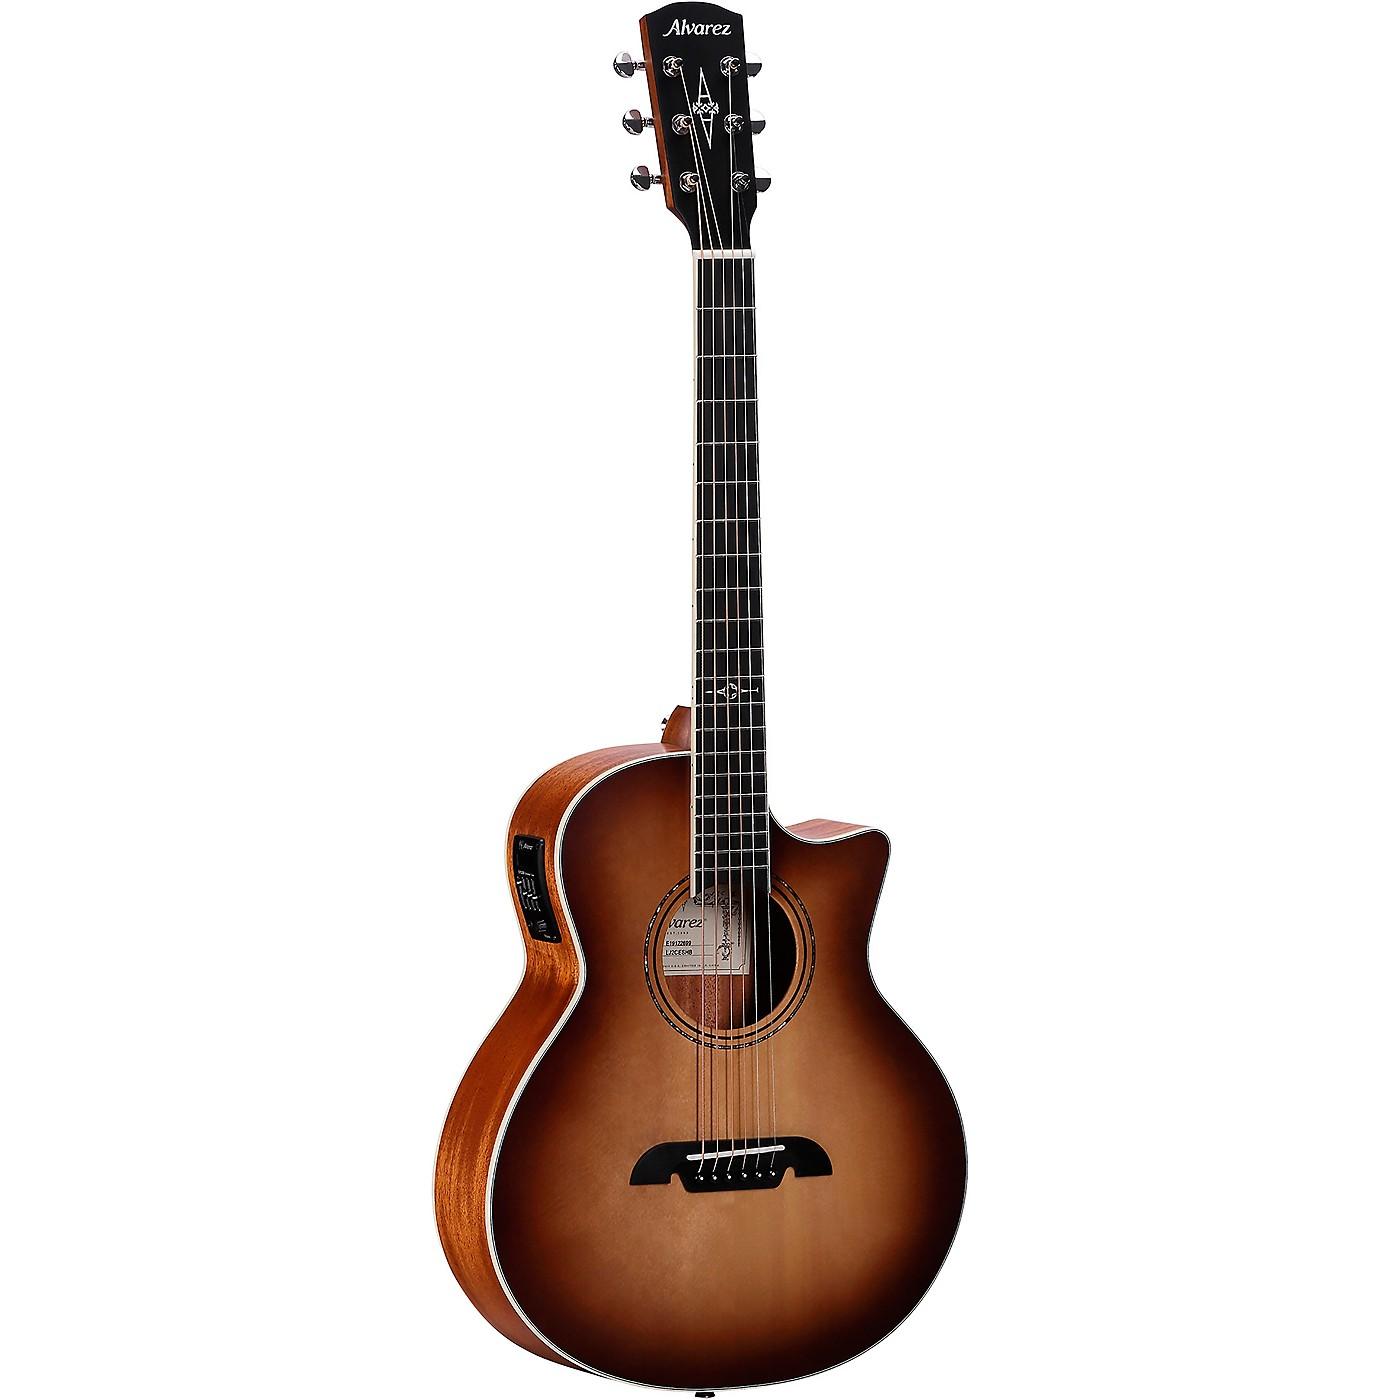 Alvarez LJ2CE Artist Little Jumbo Acoustic-Electric Guitar thumbnail